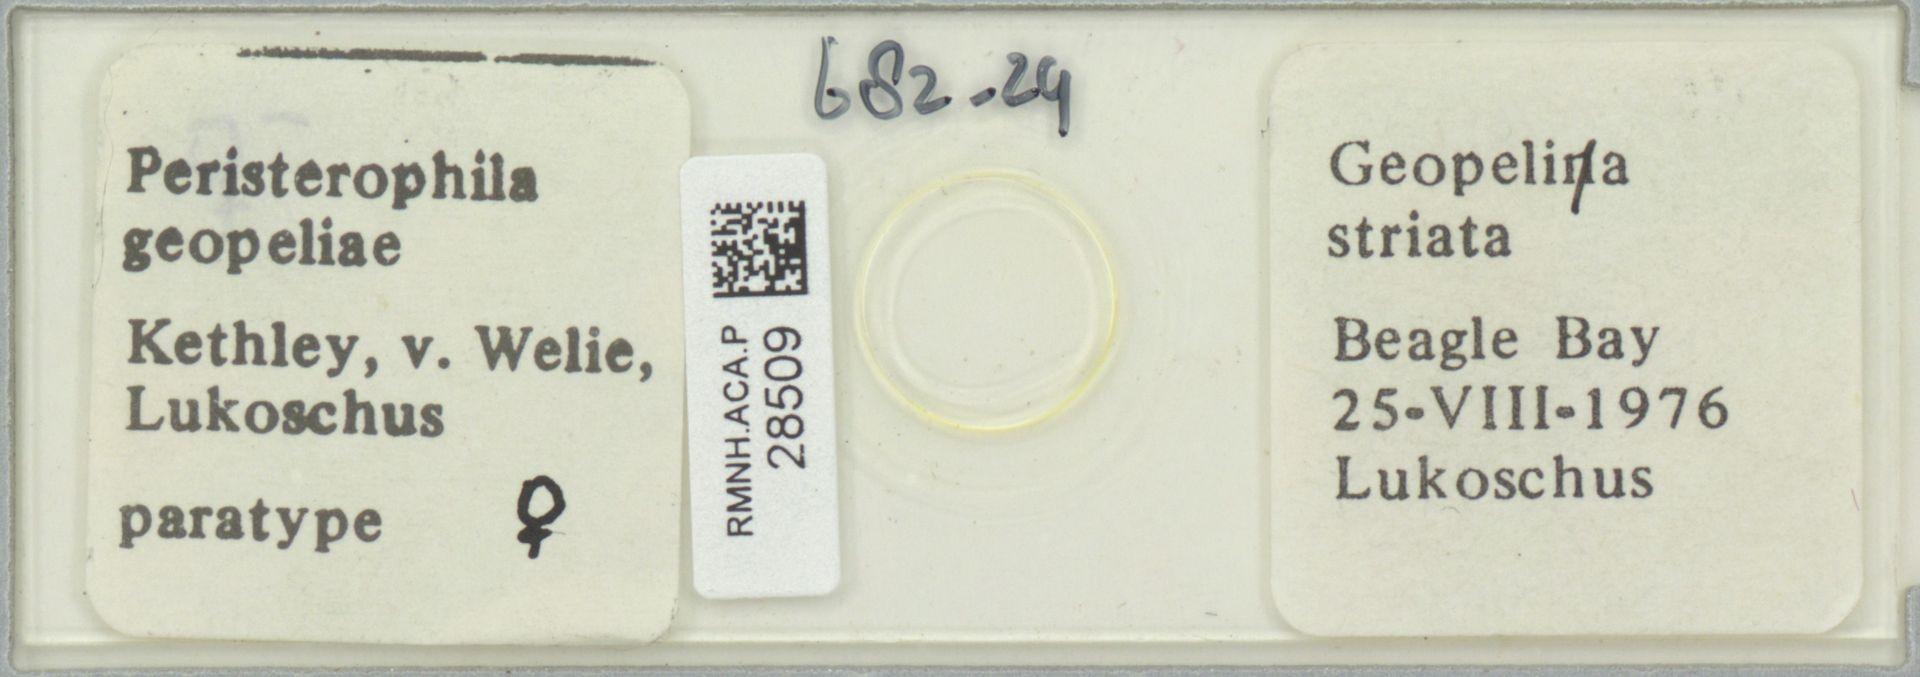 RMNH.ACA.P.28509 | Peristerophila geopeliae Kethley, v. Welie, Lukoschus